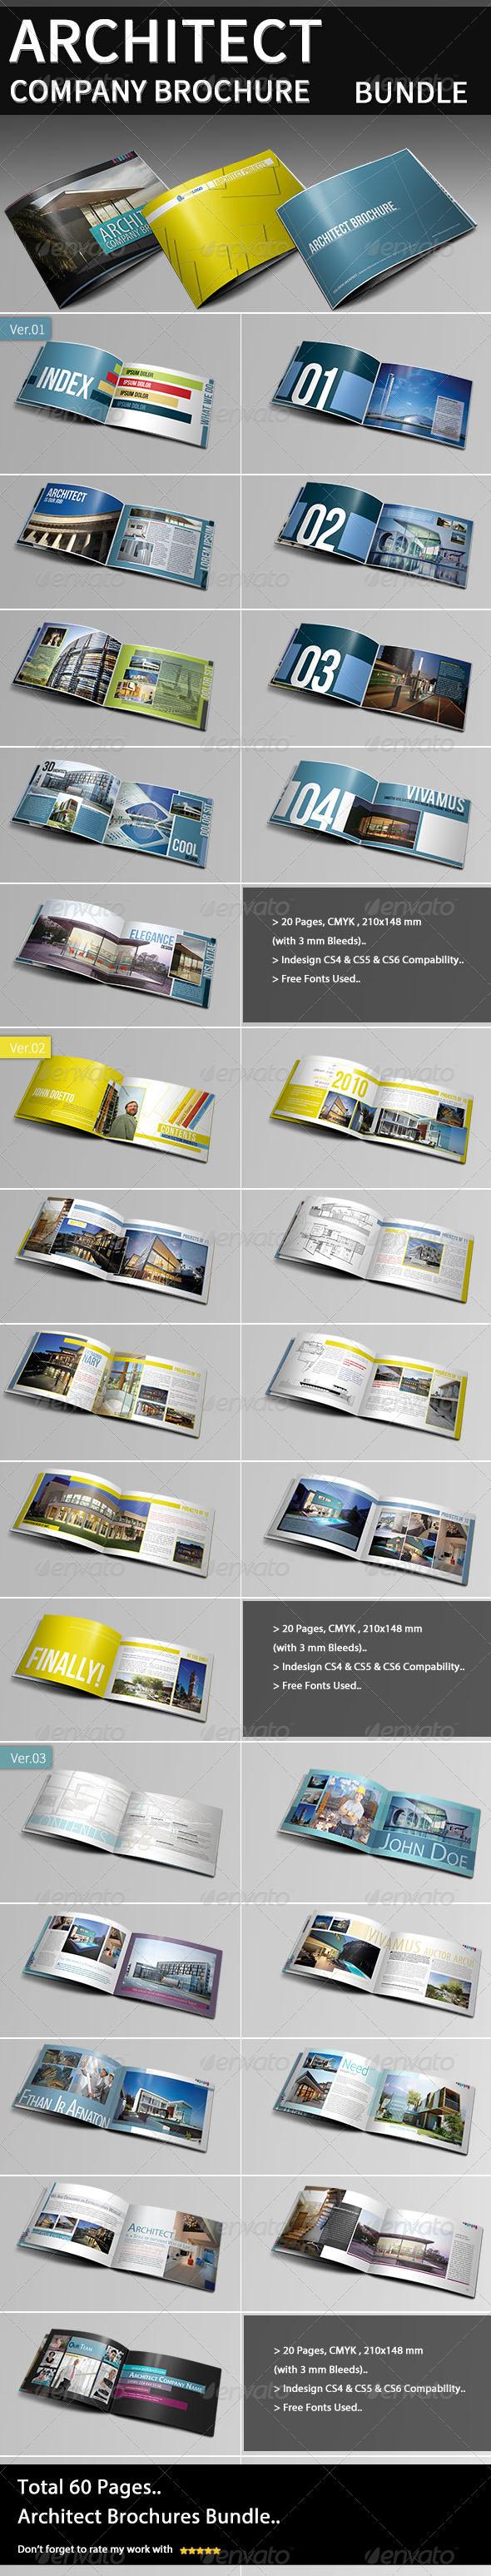 GraphicRiver Architect Company Brochure Bundle 4090990